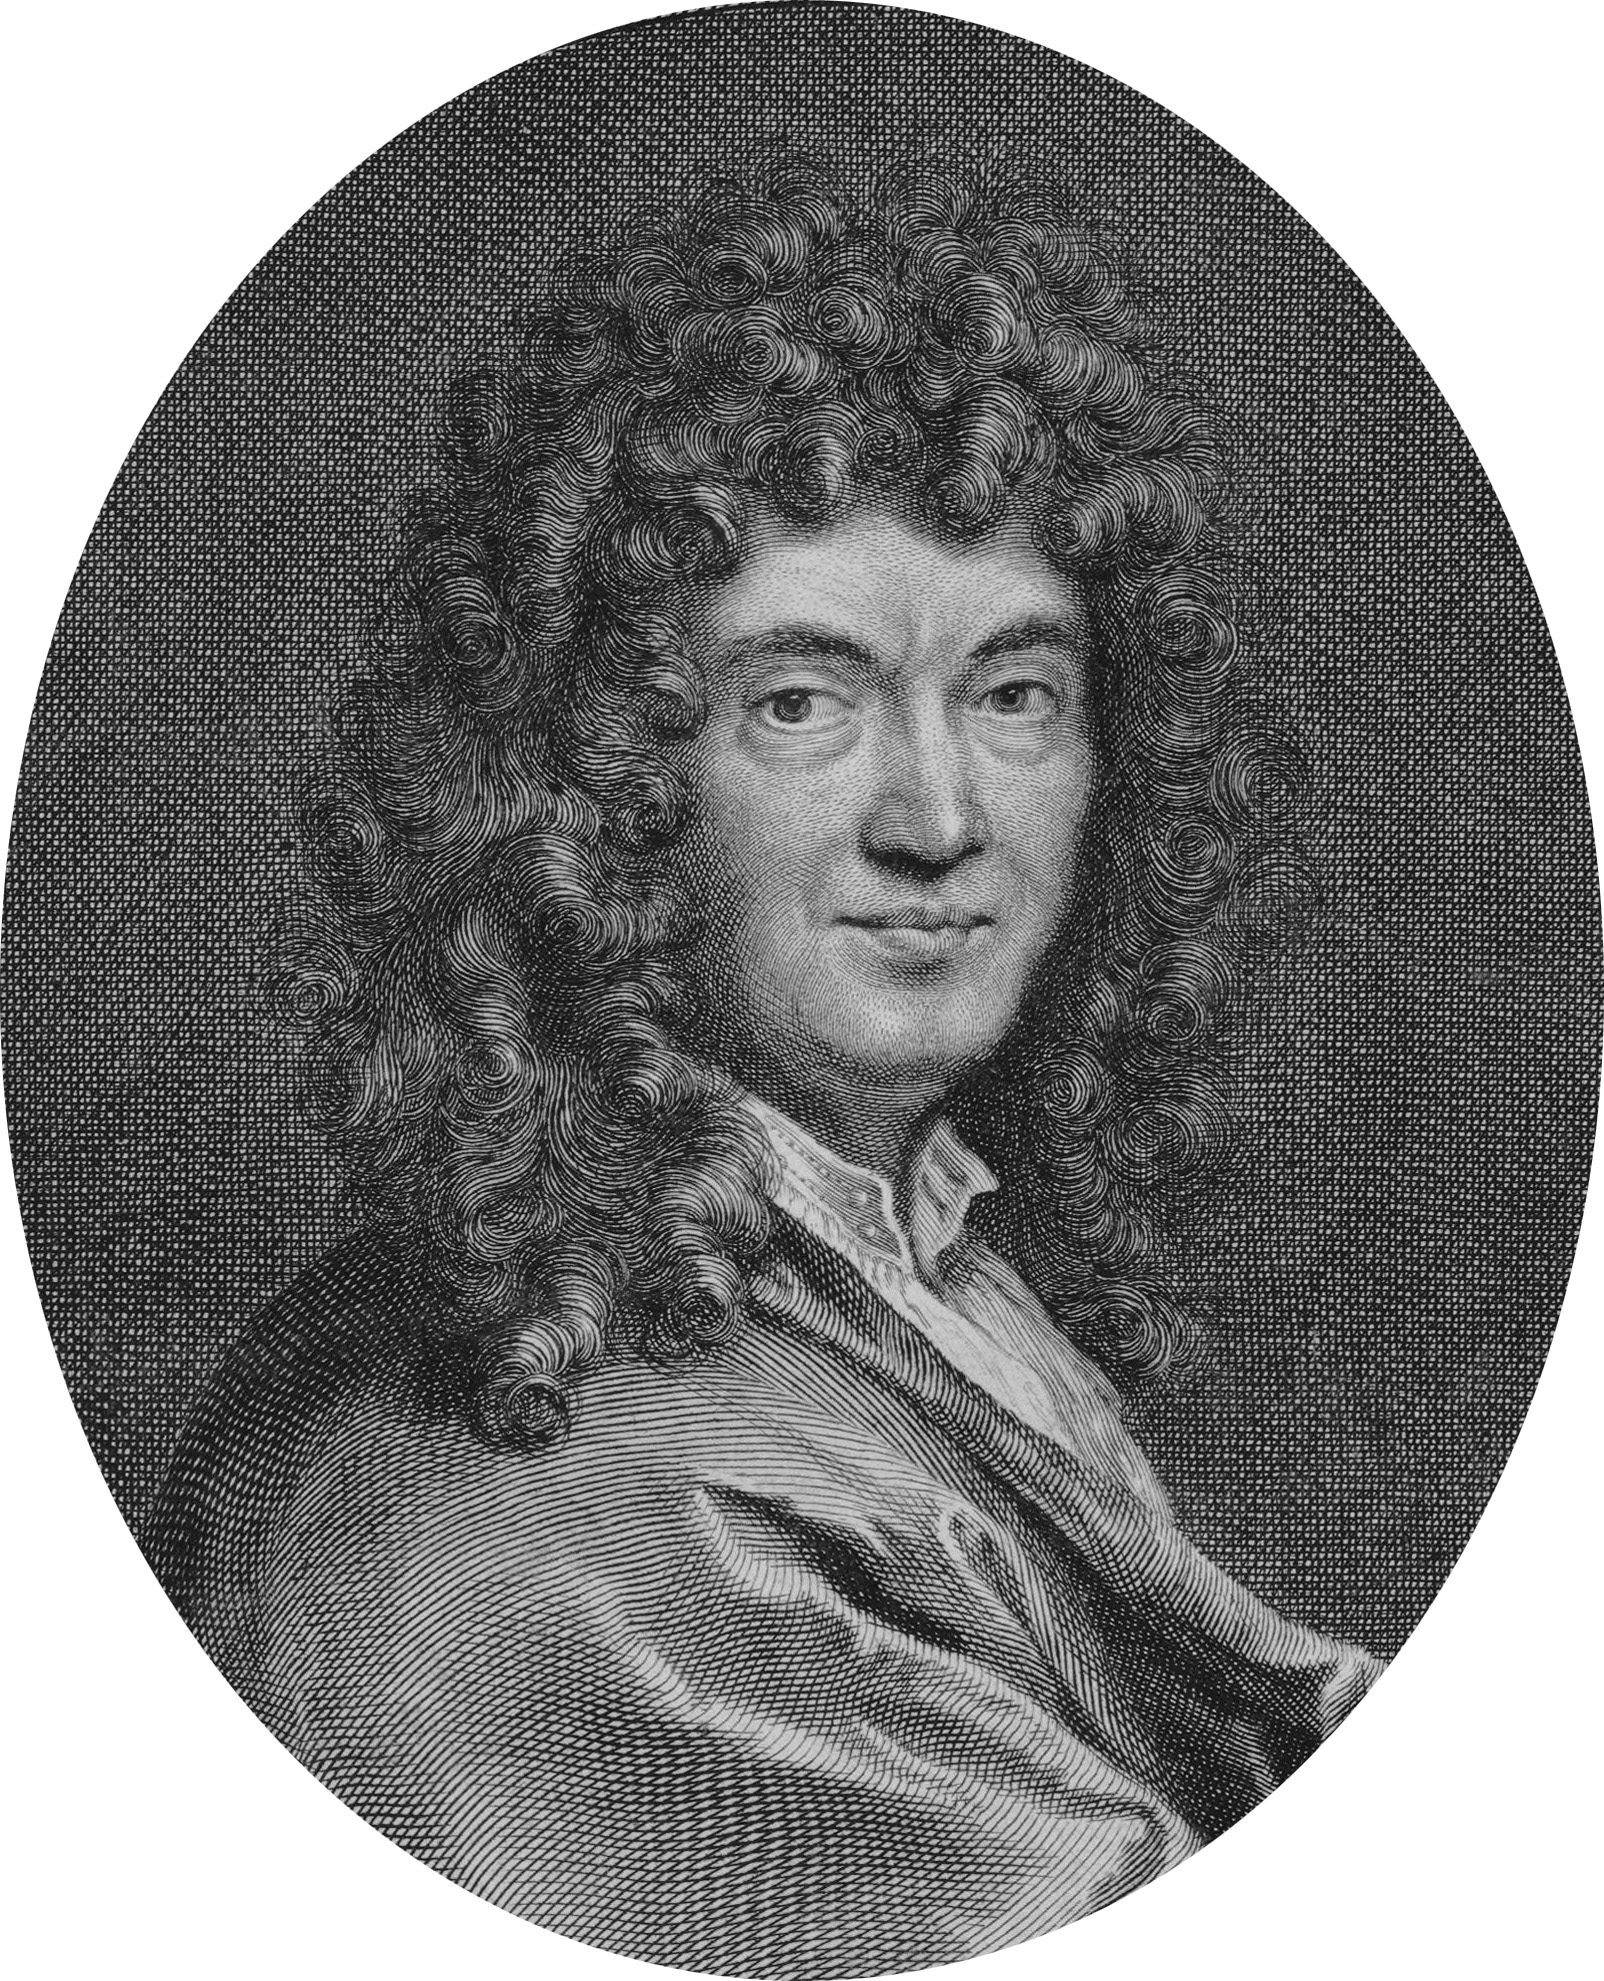 Engraved portrait of Perrault by [[Gérard Edelinck]]